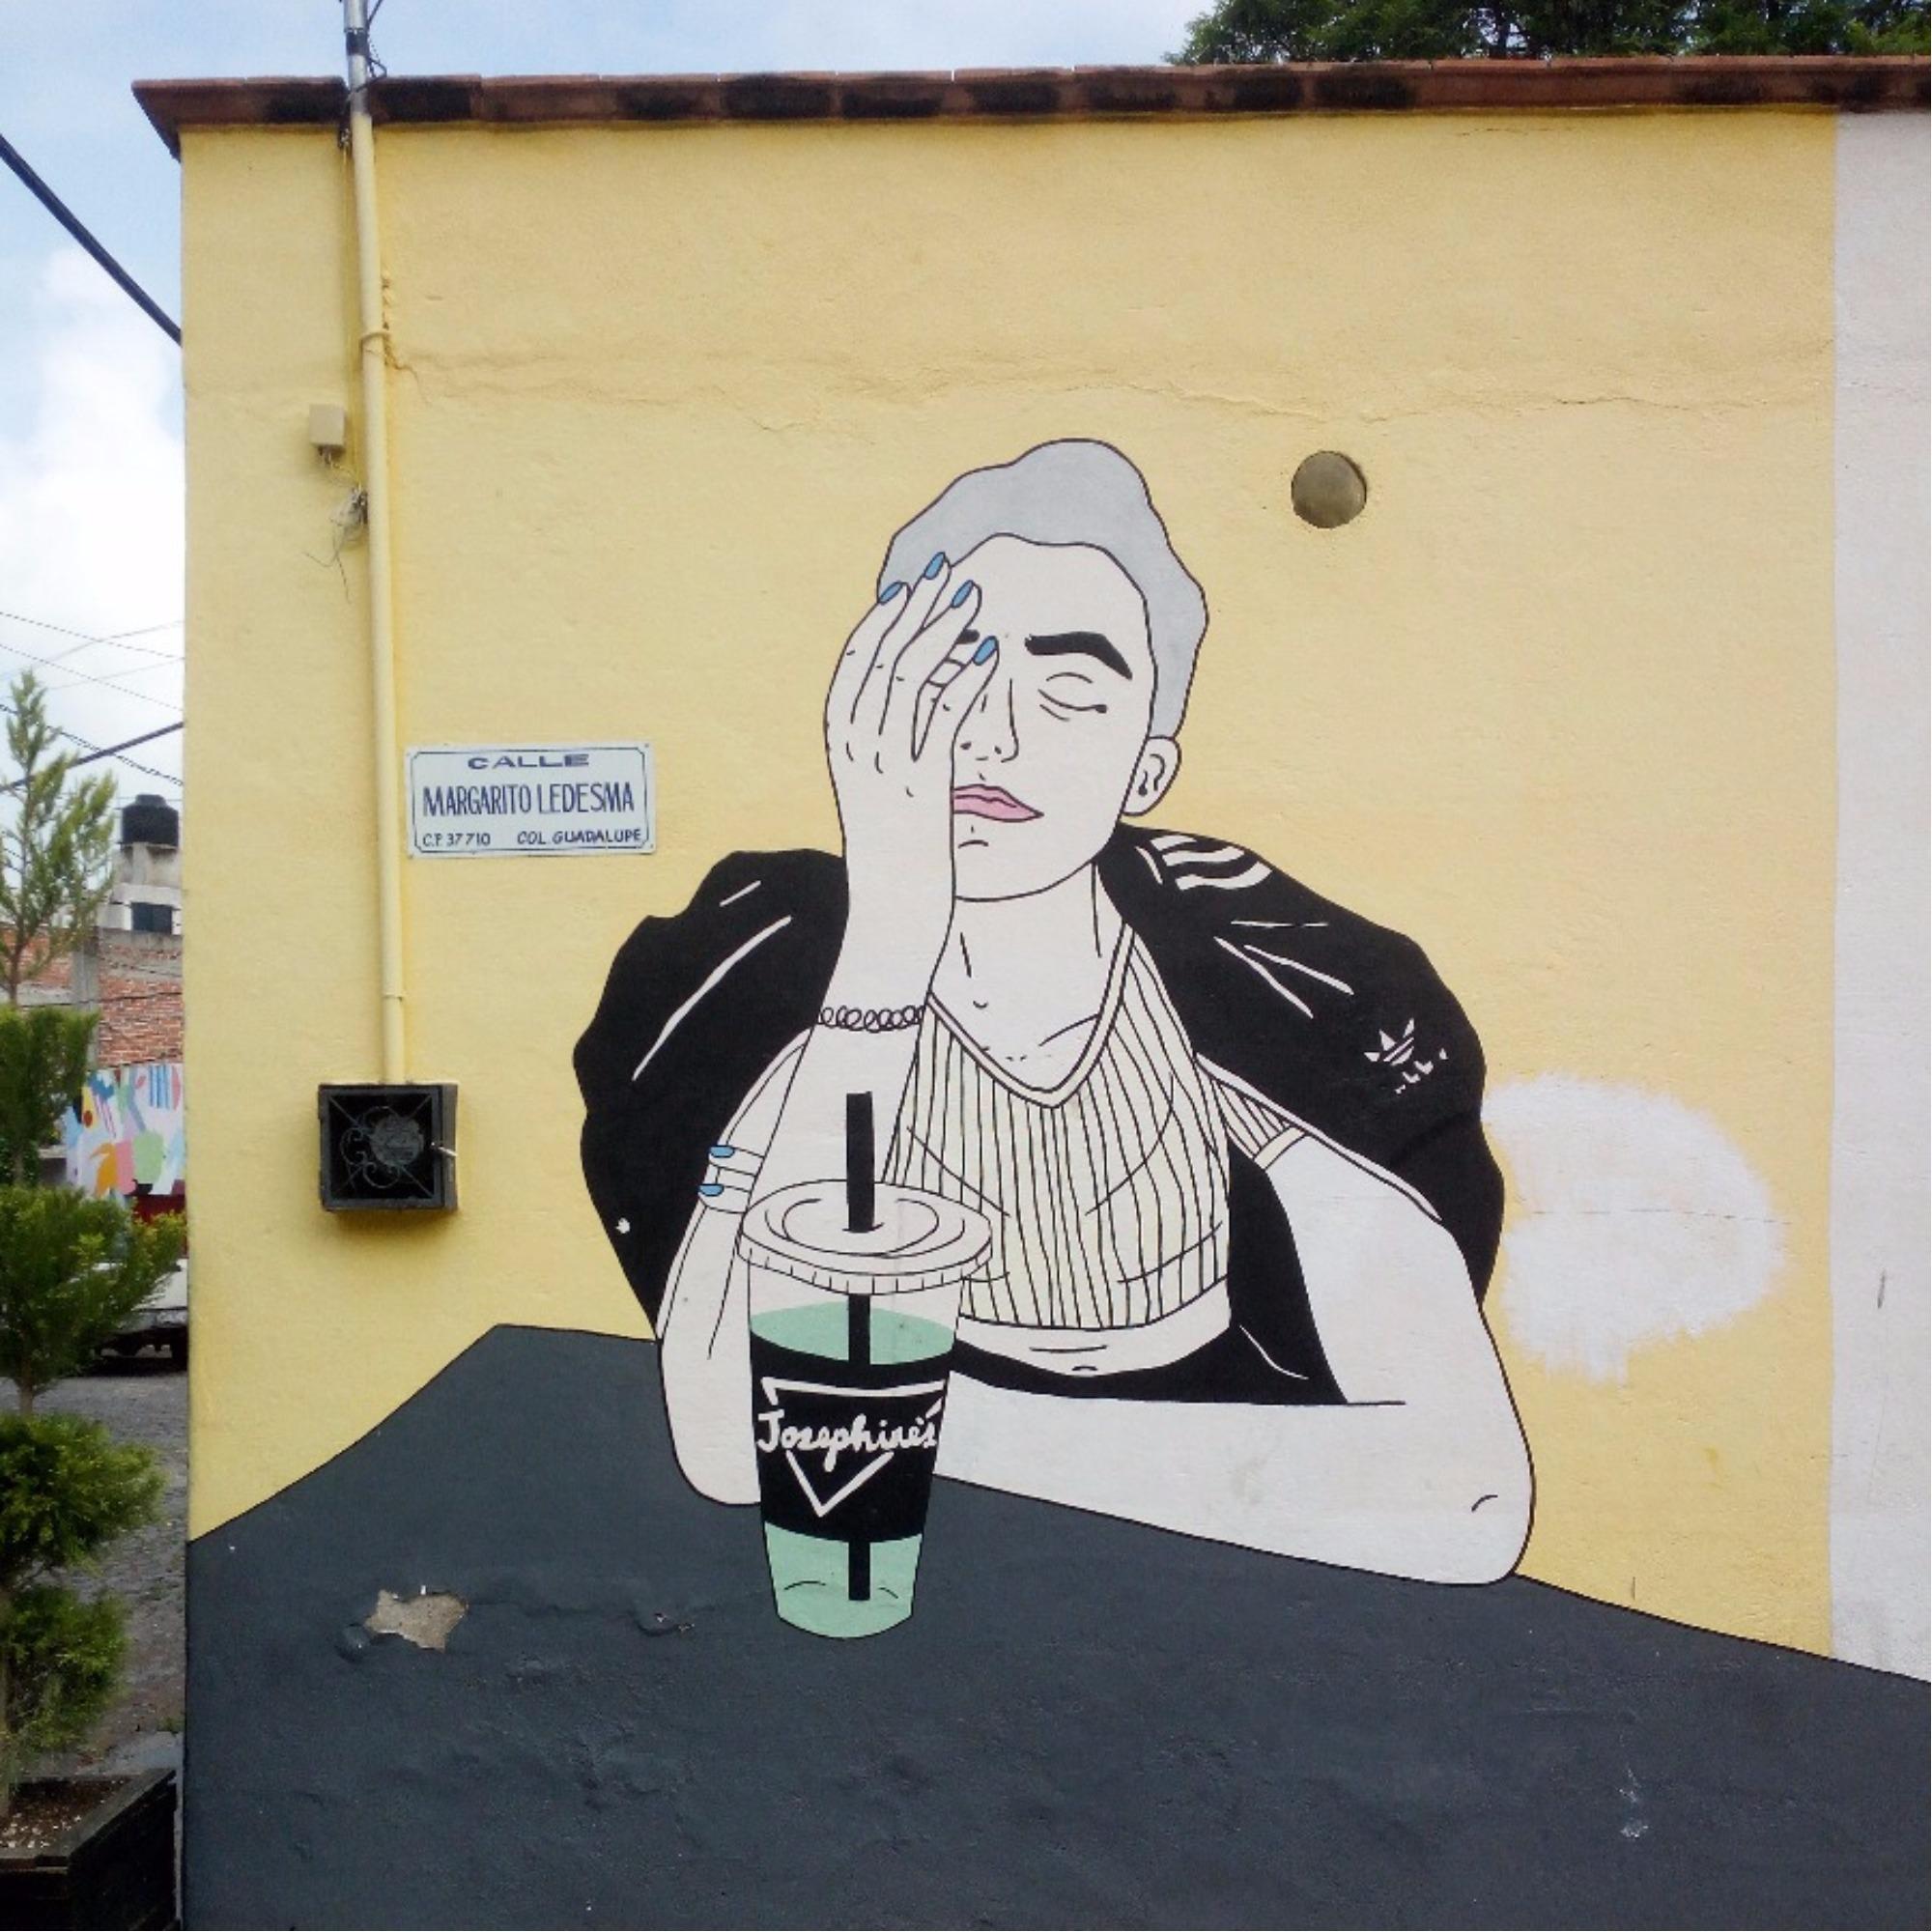 Street Art Mexico: San Miguel de Allende Edition - Northern Lauren